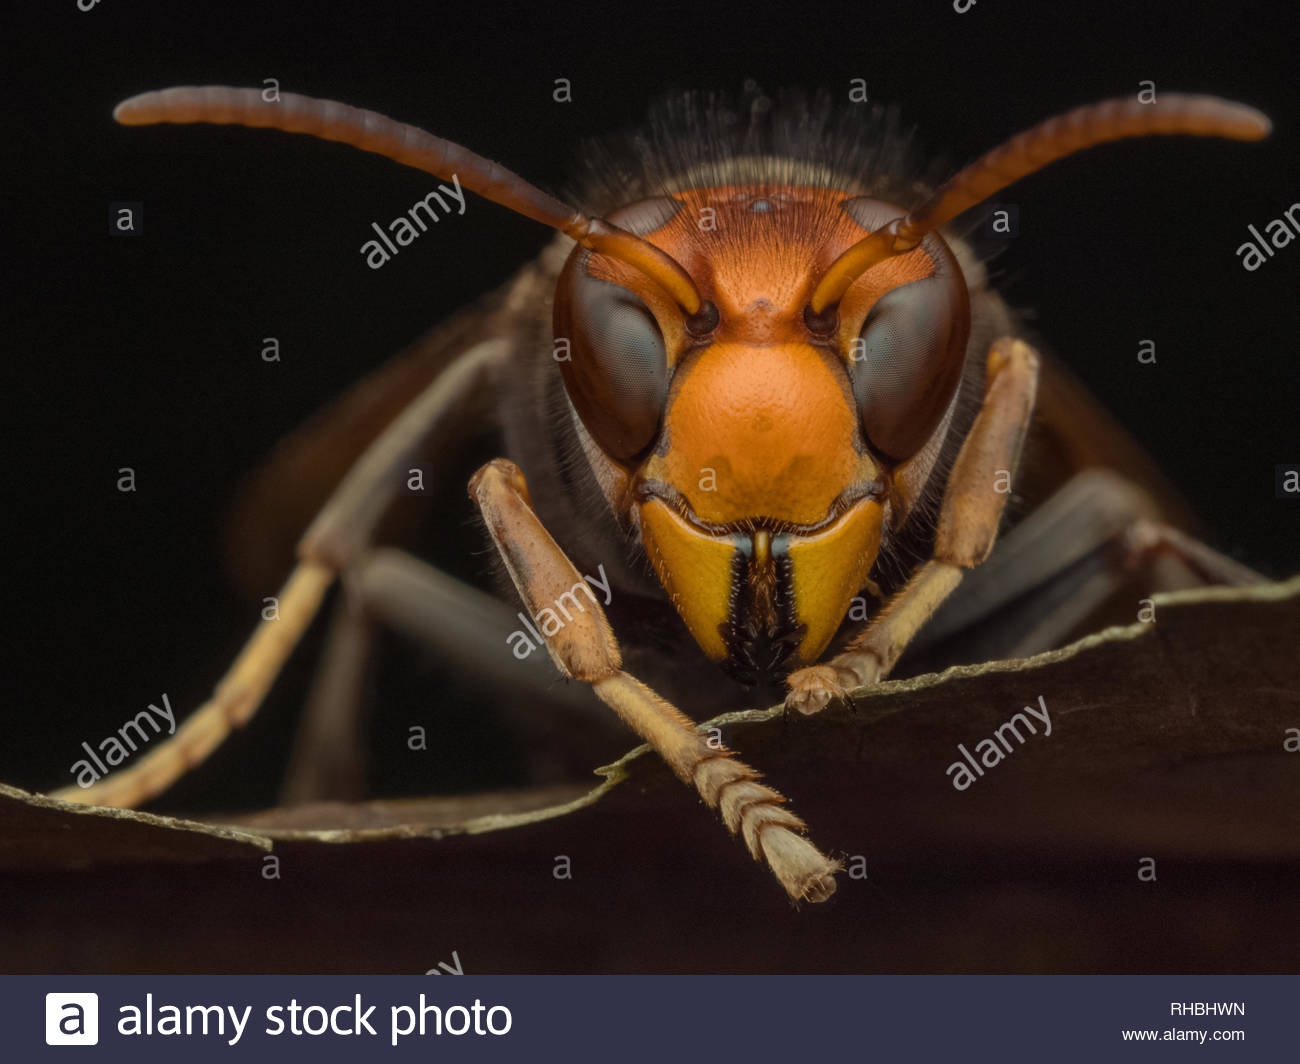 asian hornet Vespavelutina macro nature invasive species natural pest control - Stock Image